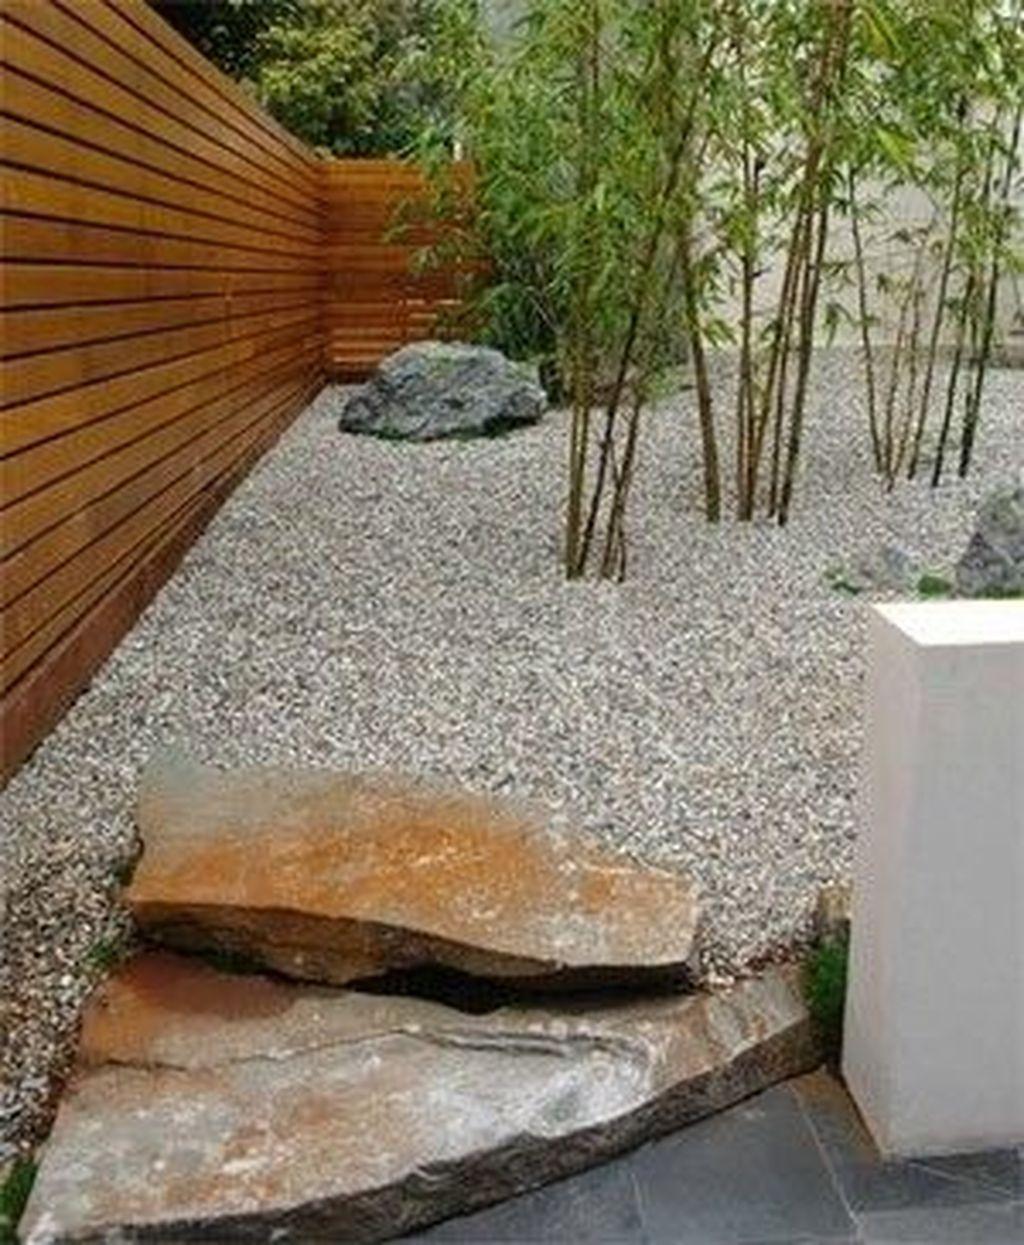 21 Landscaping Ideas For Slopes: 30 Beautiful Modern Rock Garden Ideas For Backyard